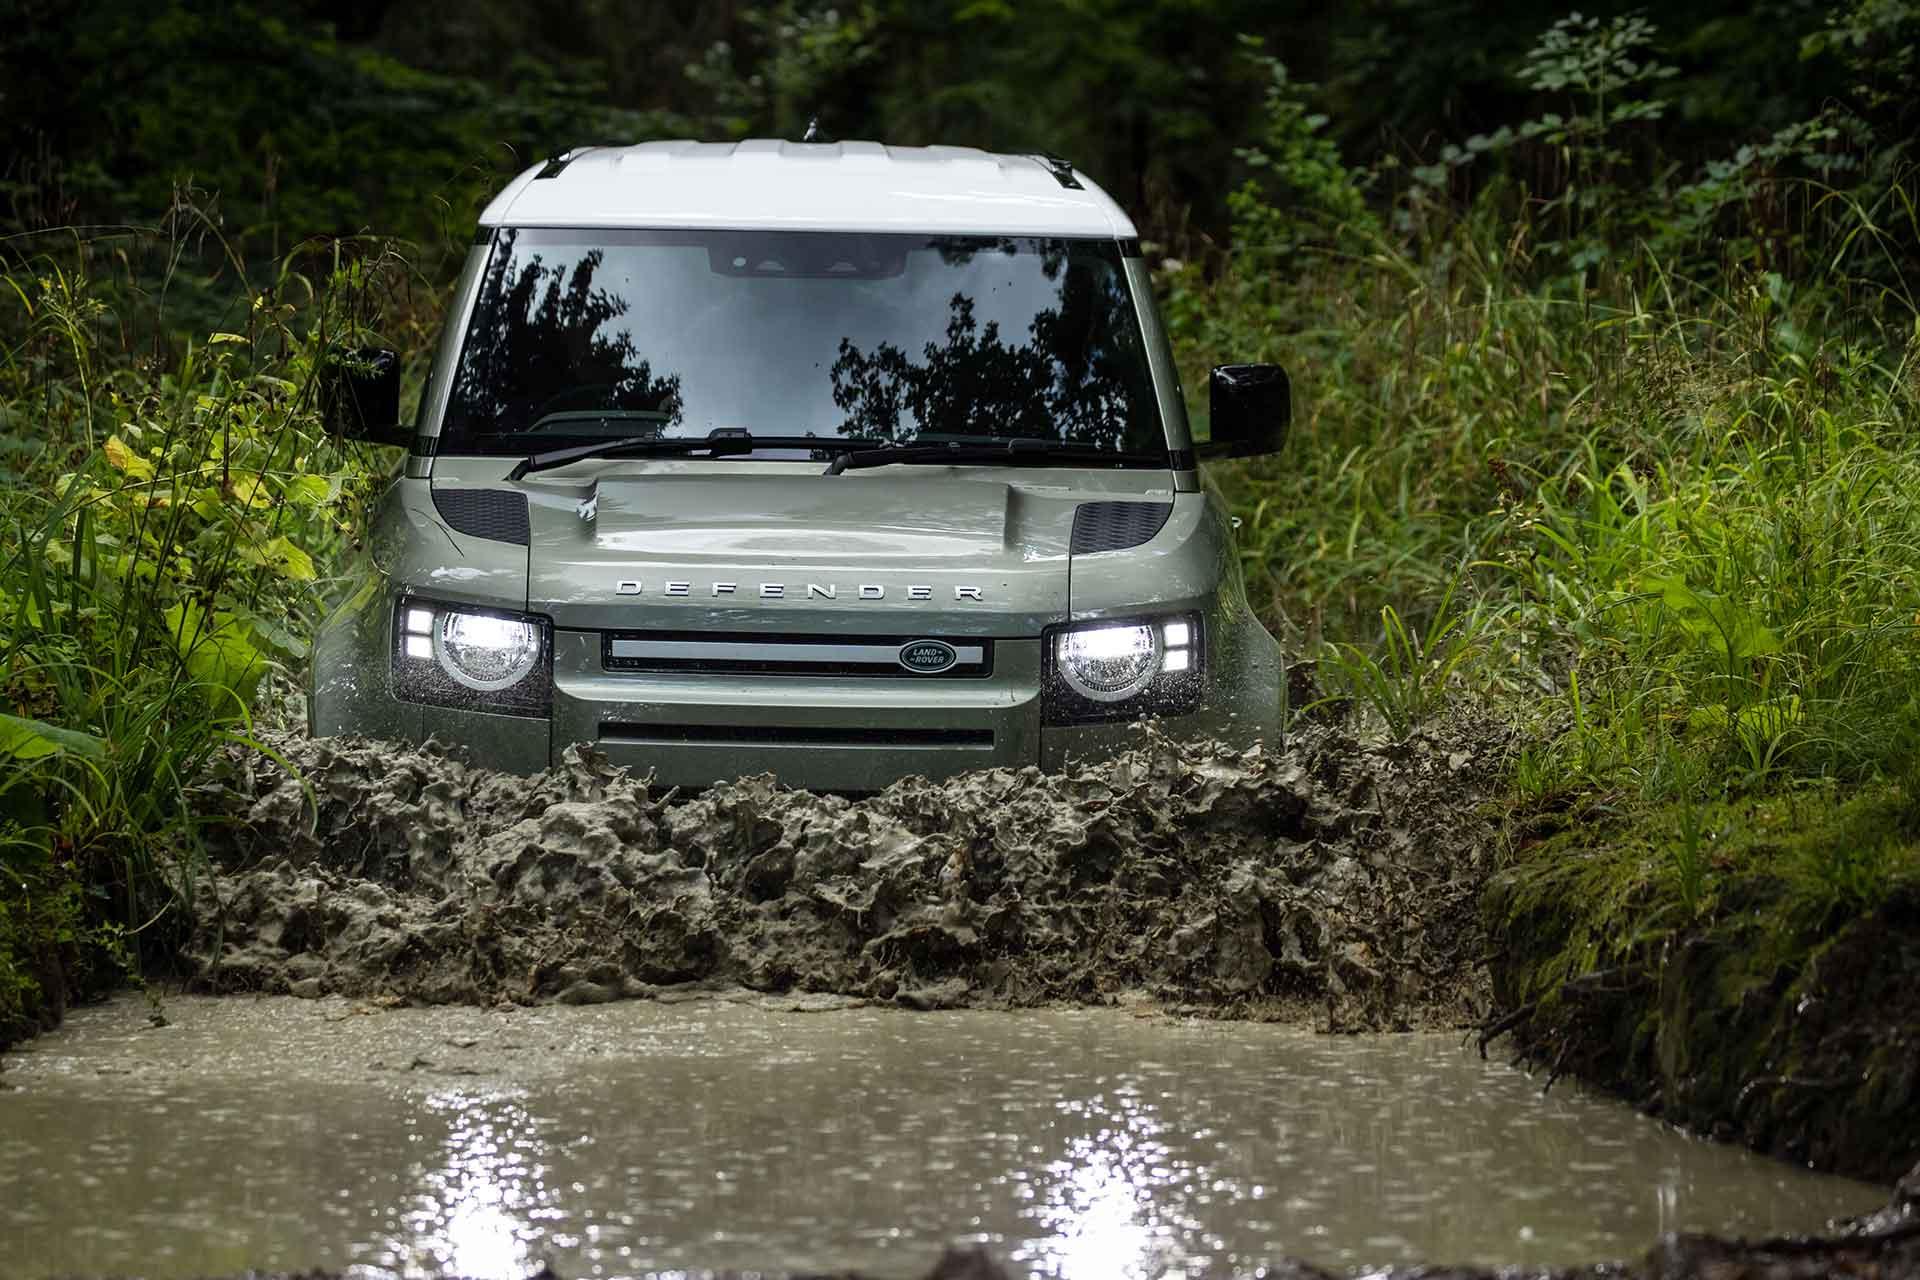 New Land Rover Defender plug-in hybrid off-road